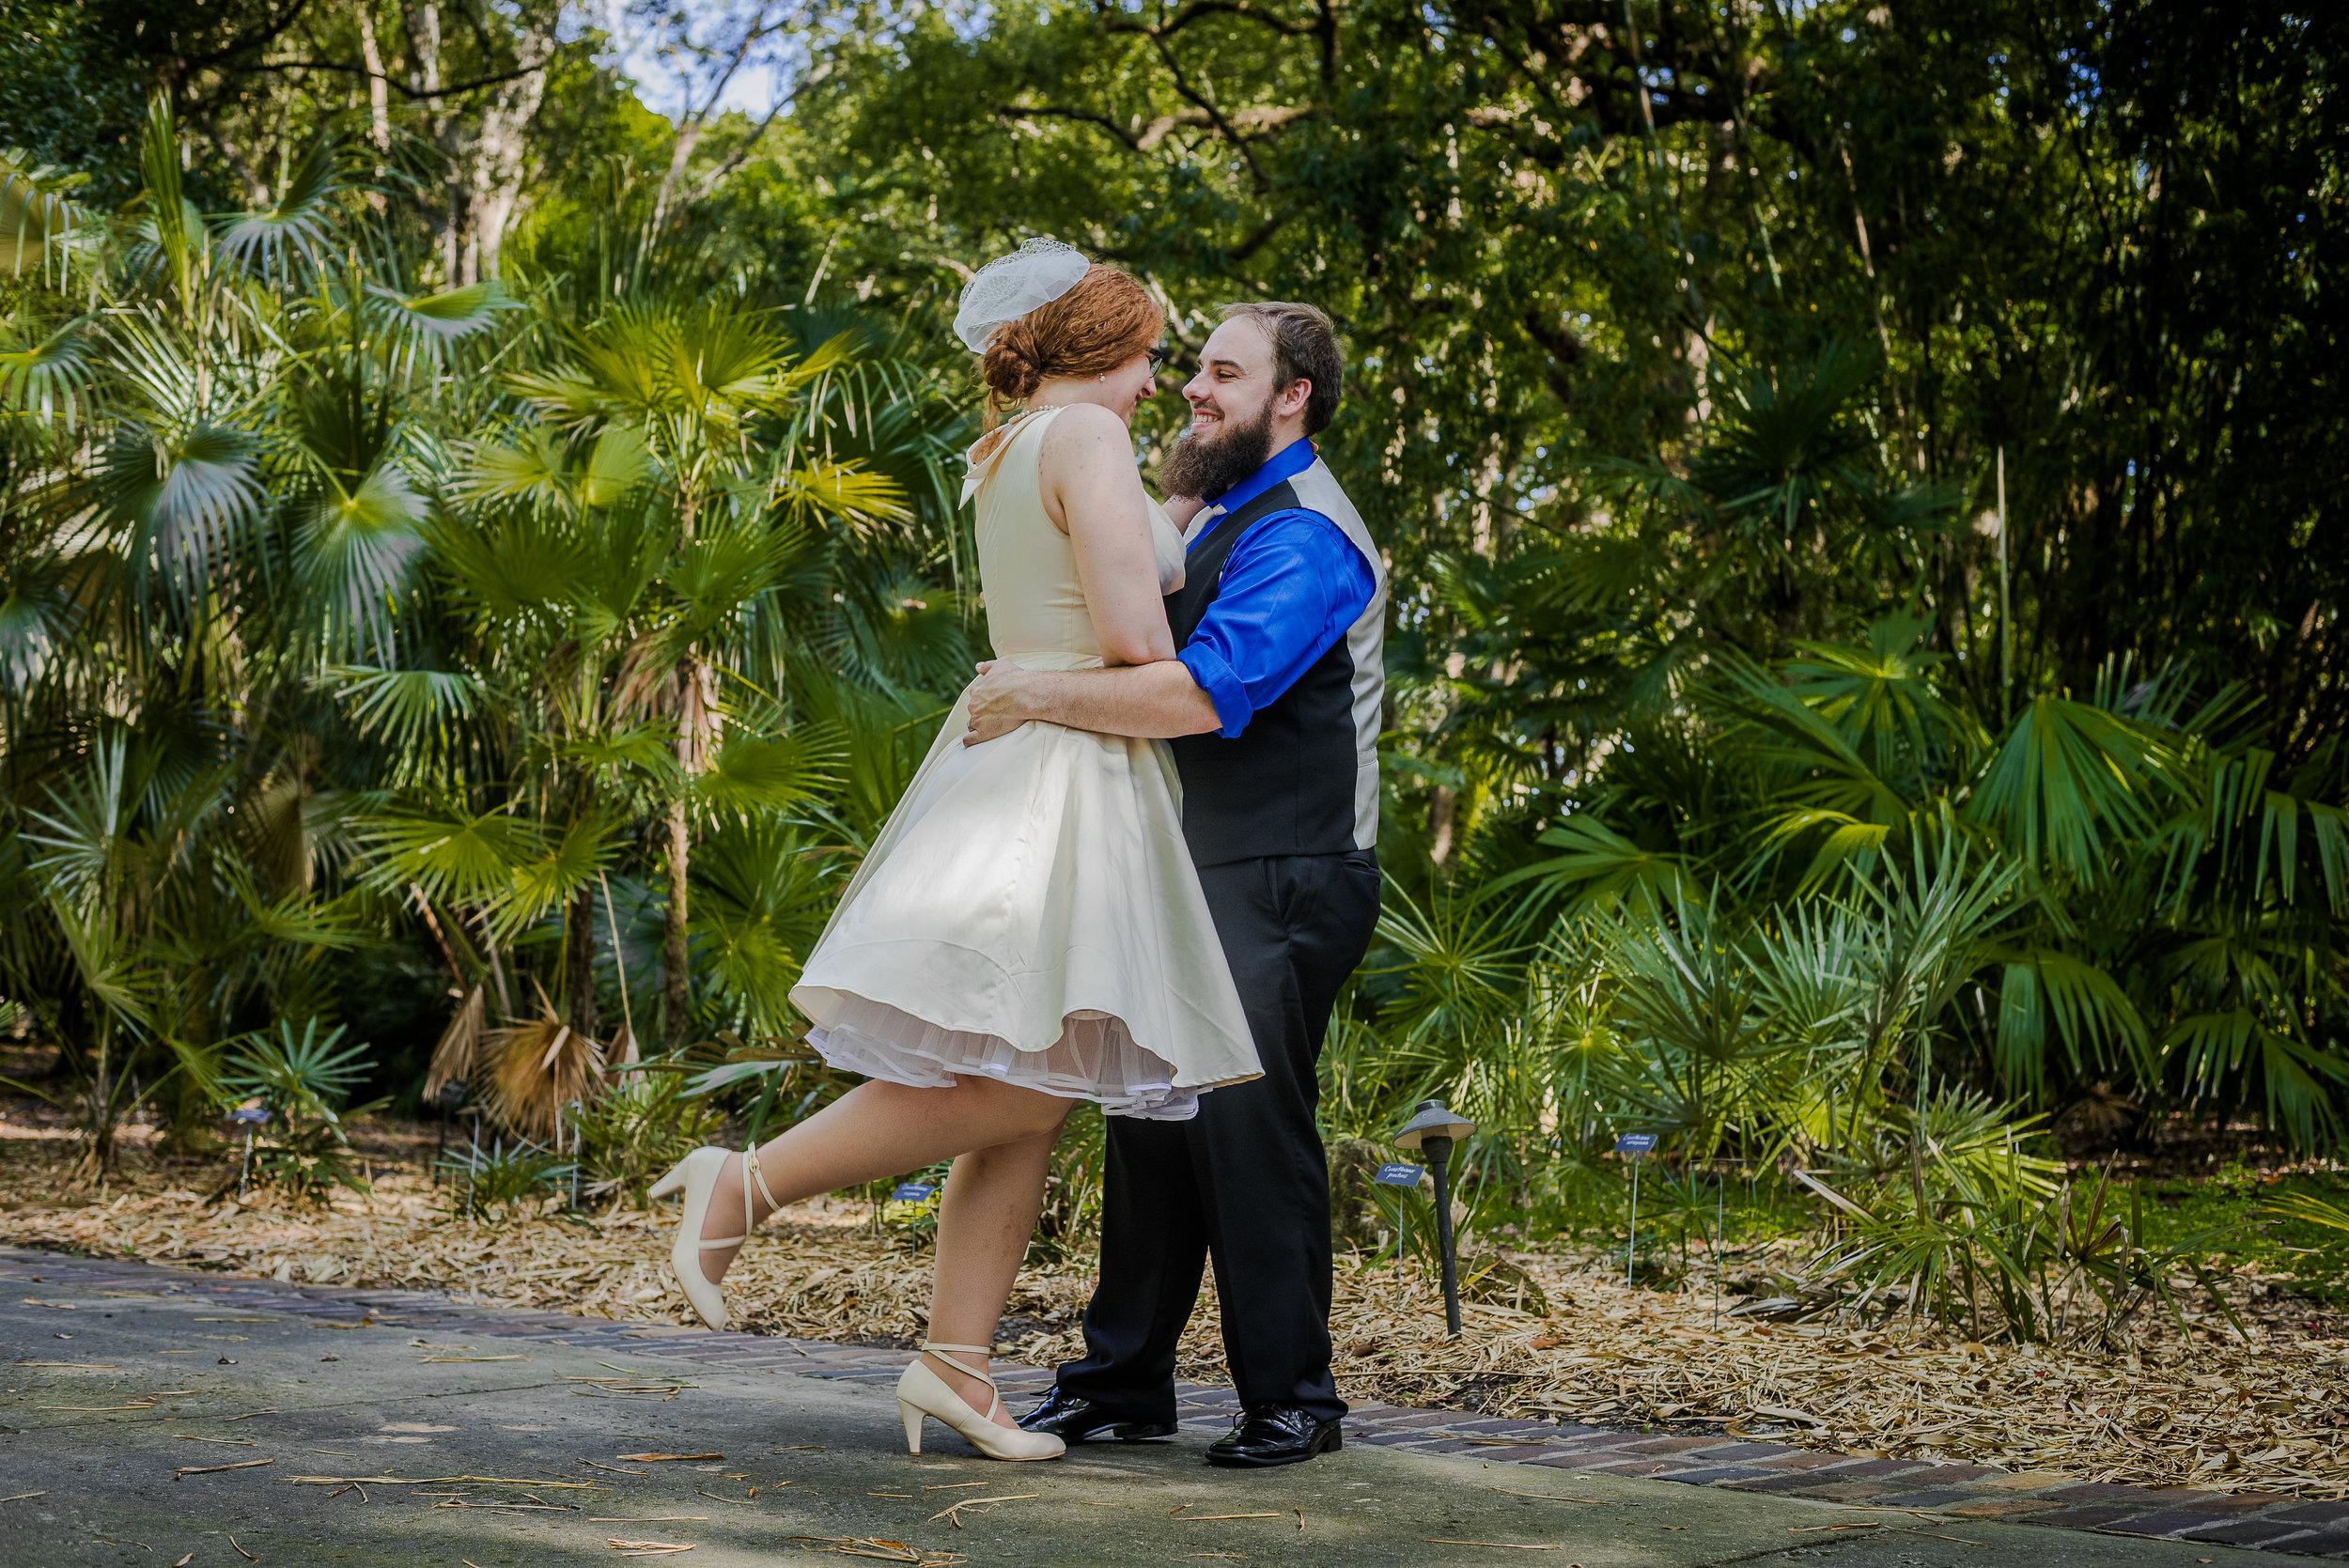 herry-garden-wedding-1-7.jpg